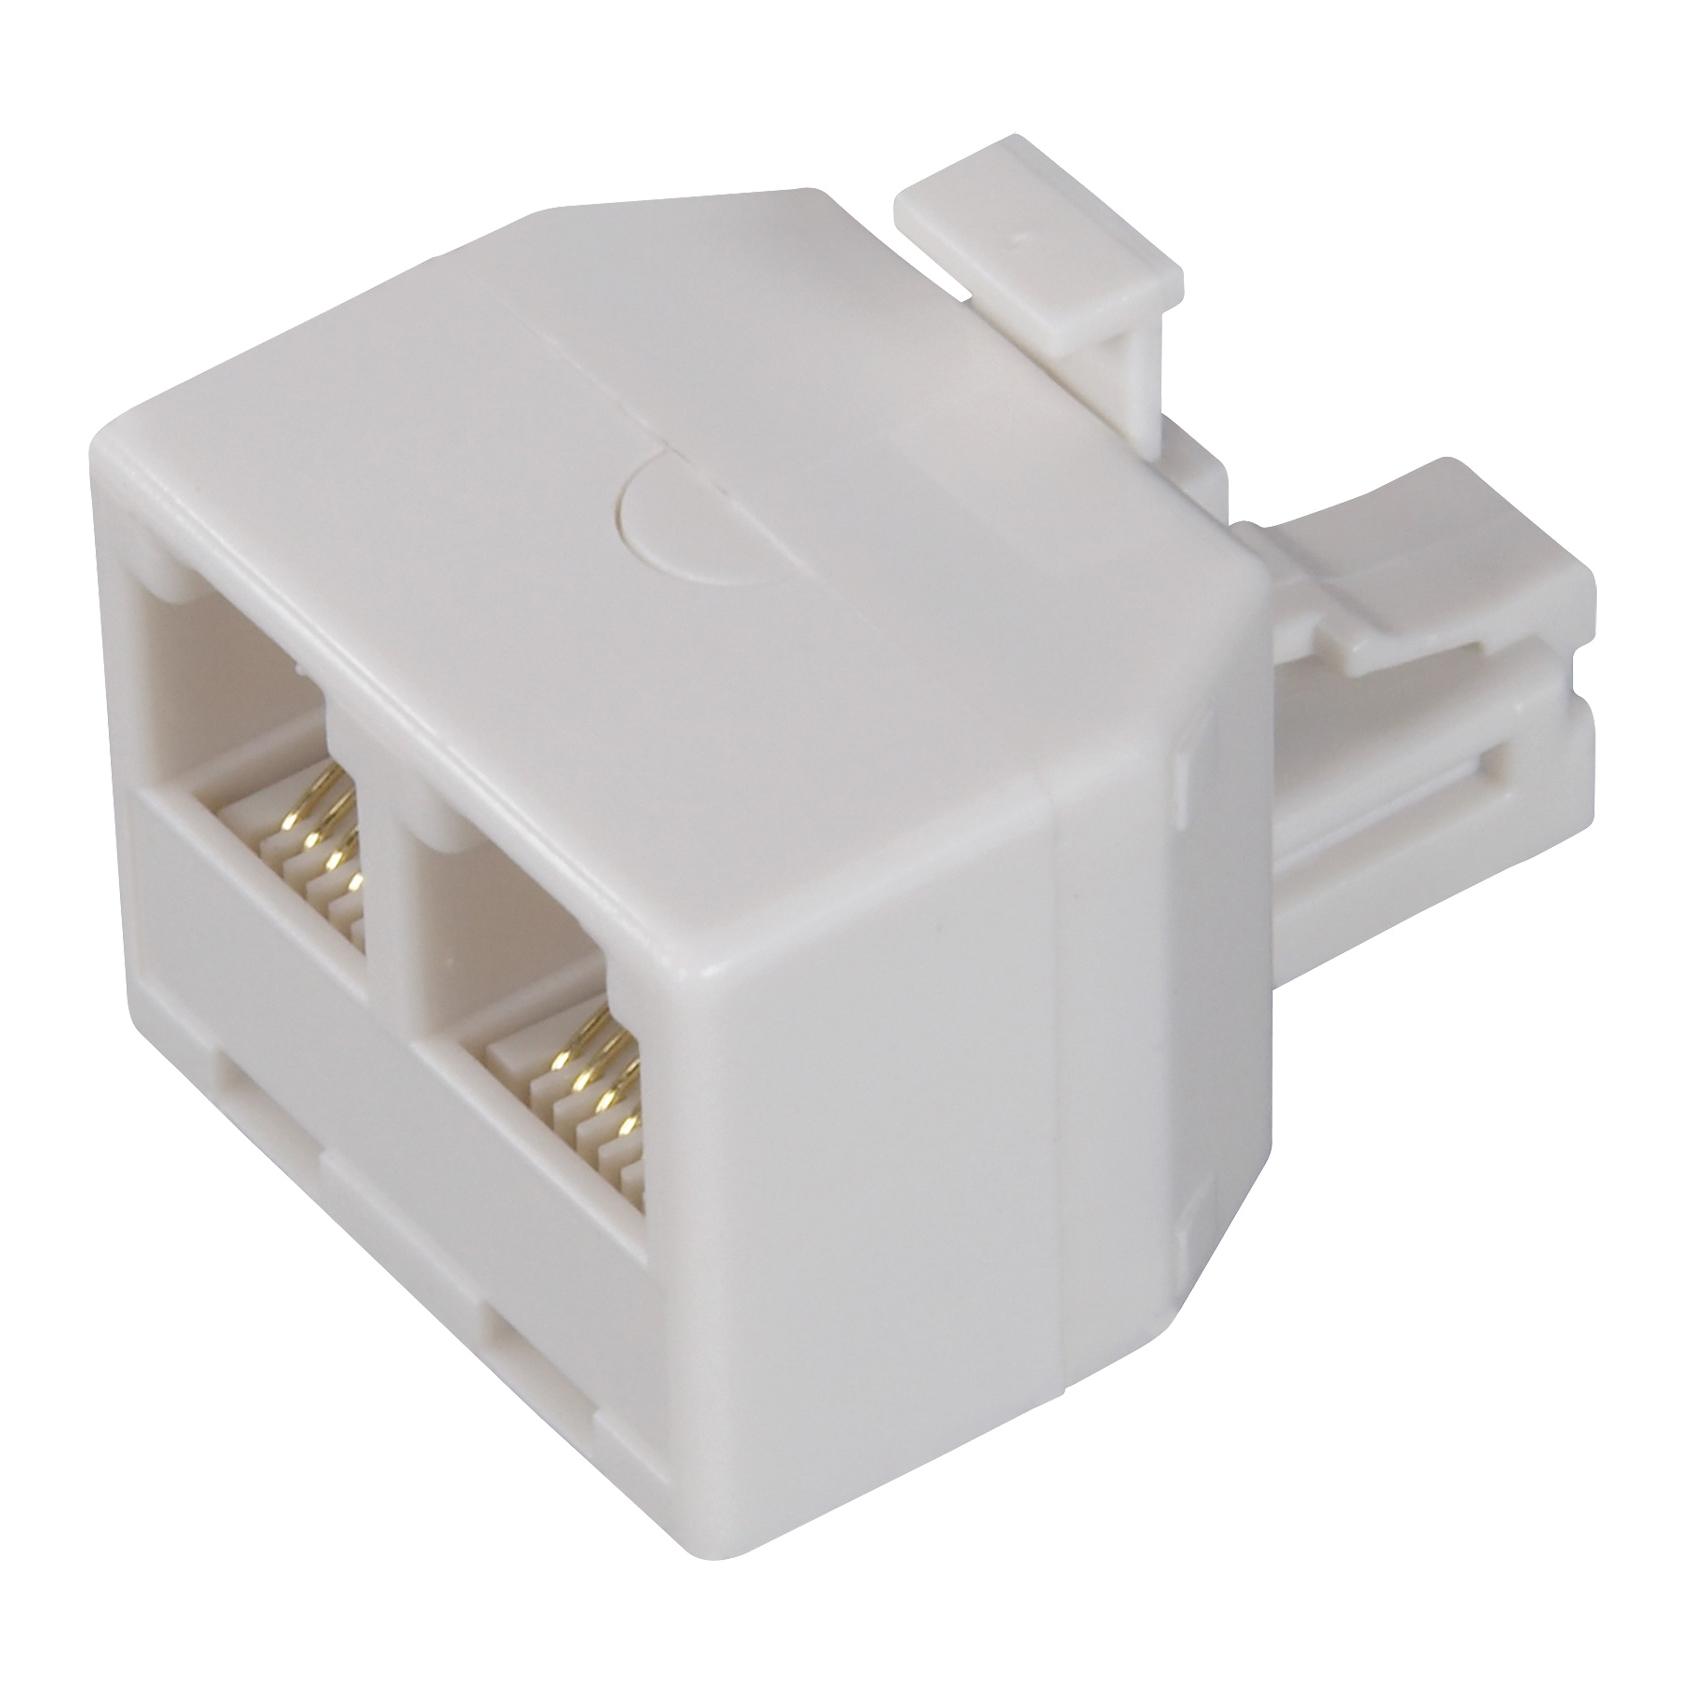 Picture of Zenith TS1001SPJ2W Telephone Splitter, 2-Port/Way, White